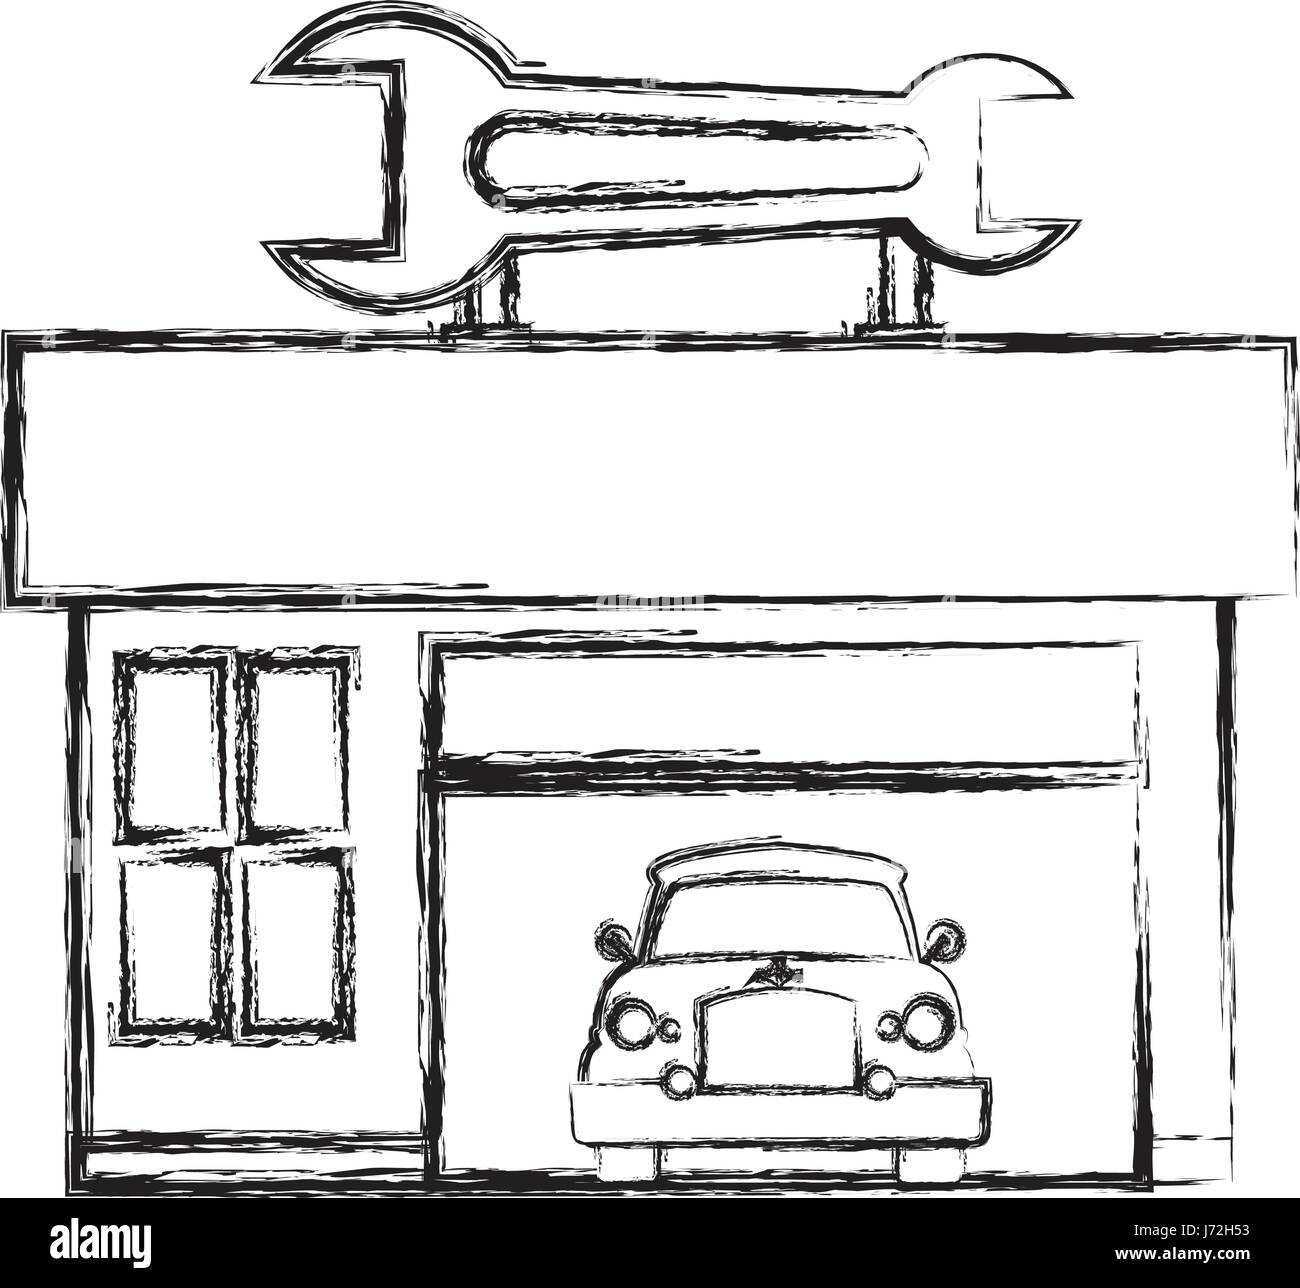 how to close garage door manually